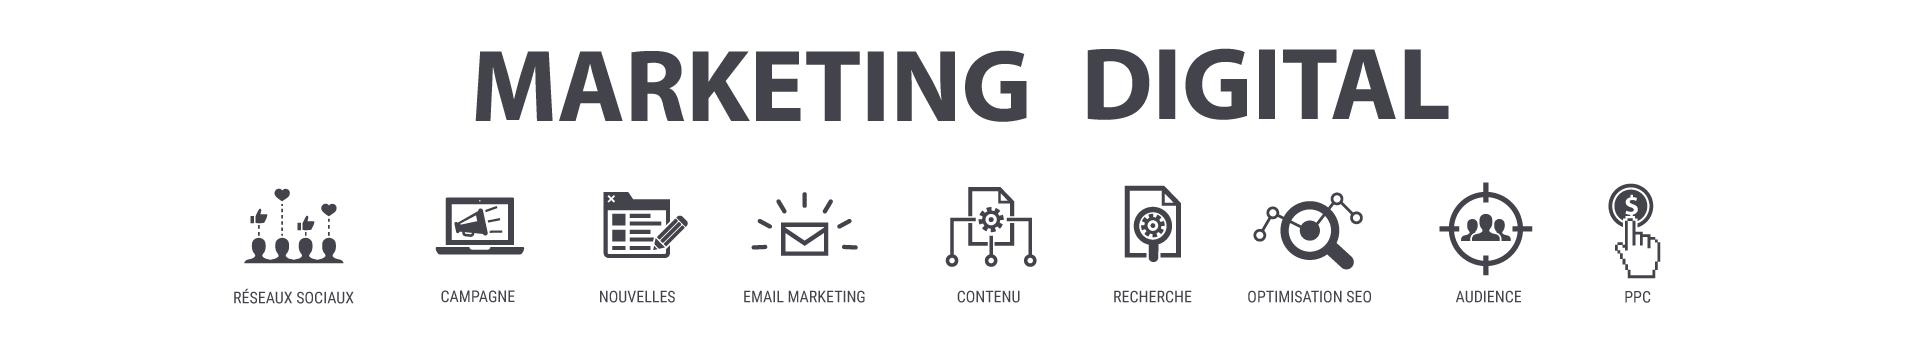 marketing-digital-banner-dpme